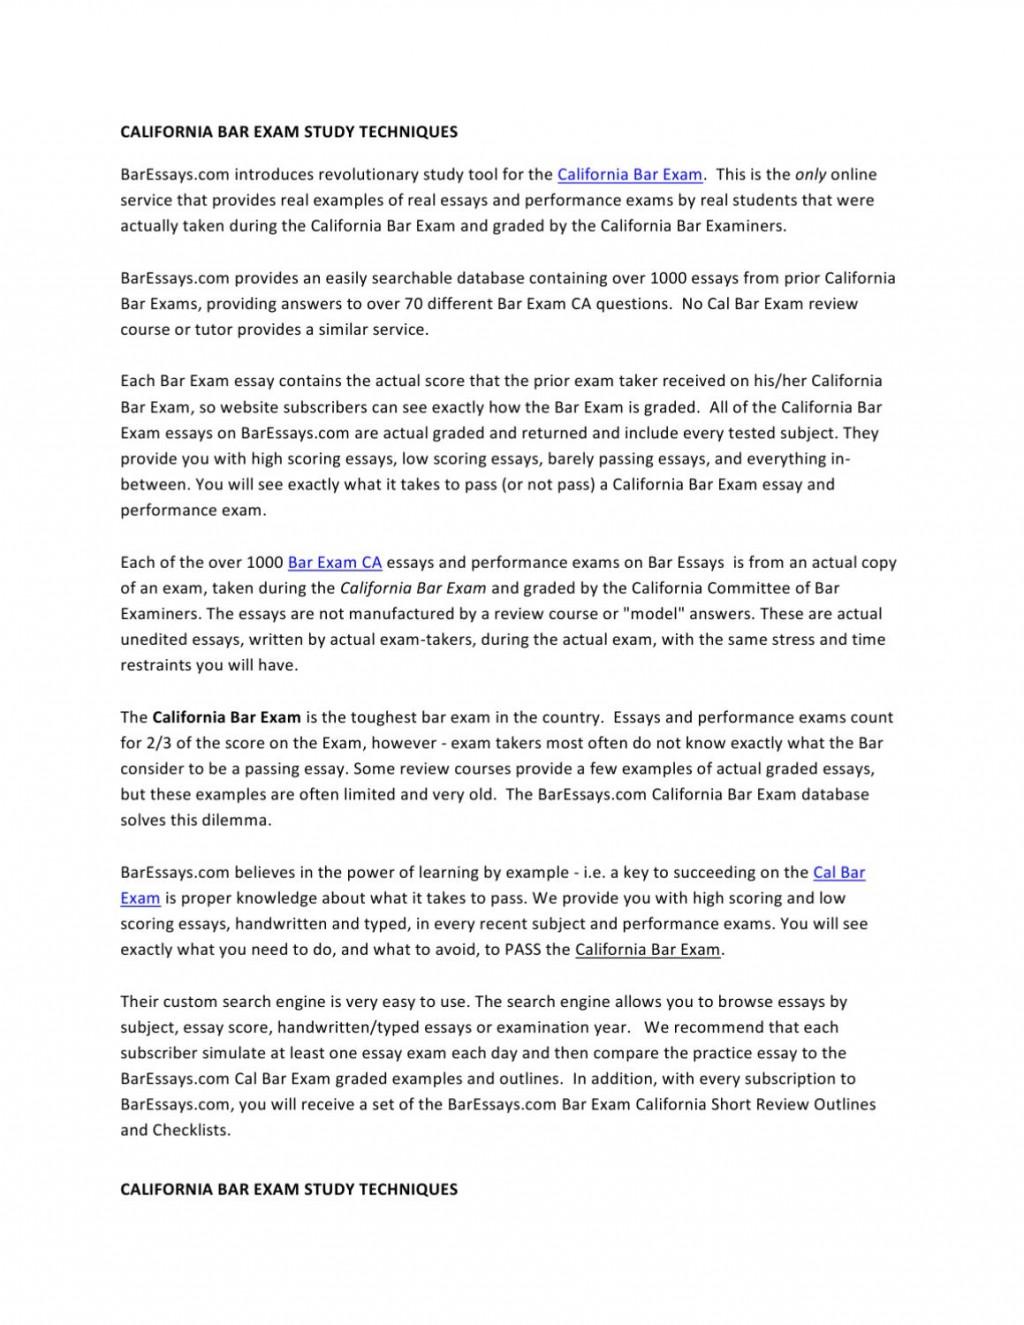 028 Essay Example California Bar Essays Page 1 Marvelous July 2017 Exam Graded February 2018 Large